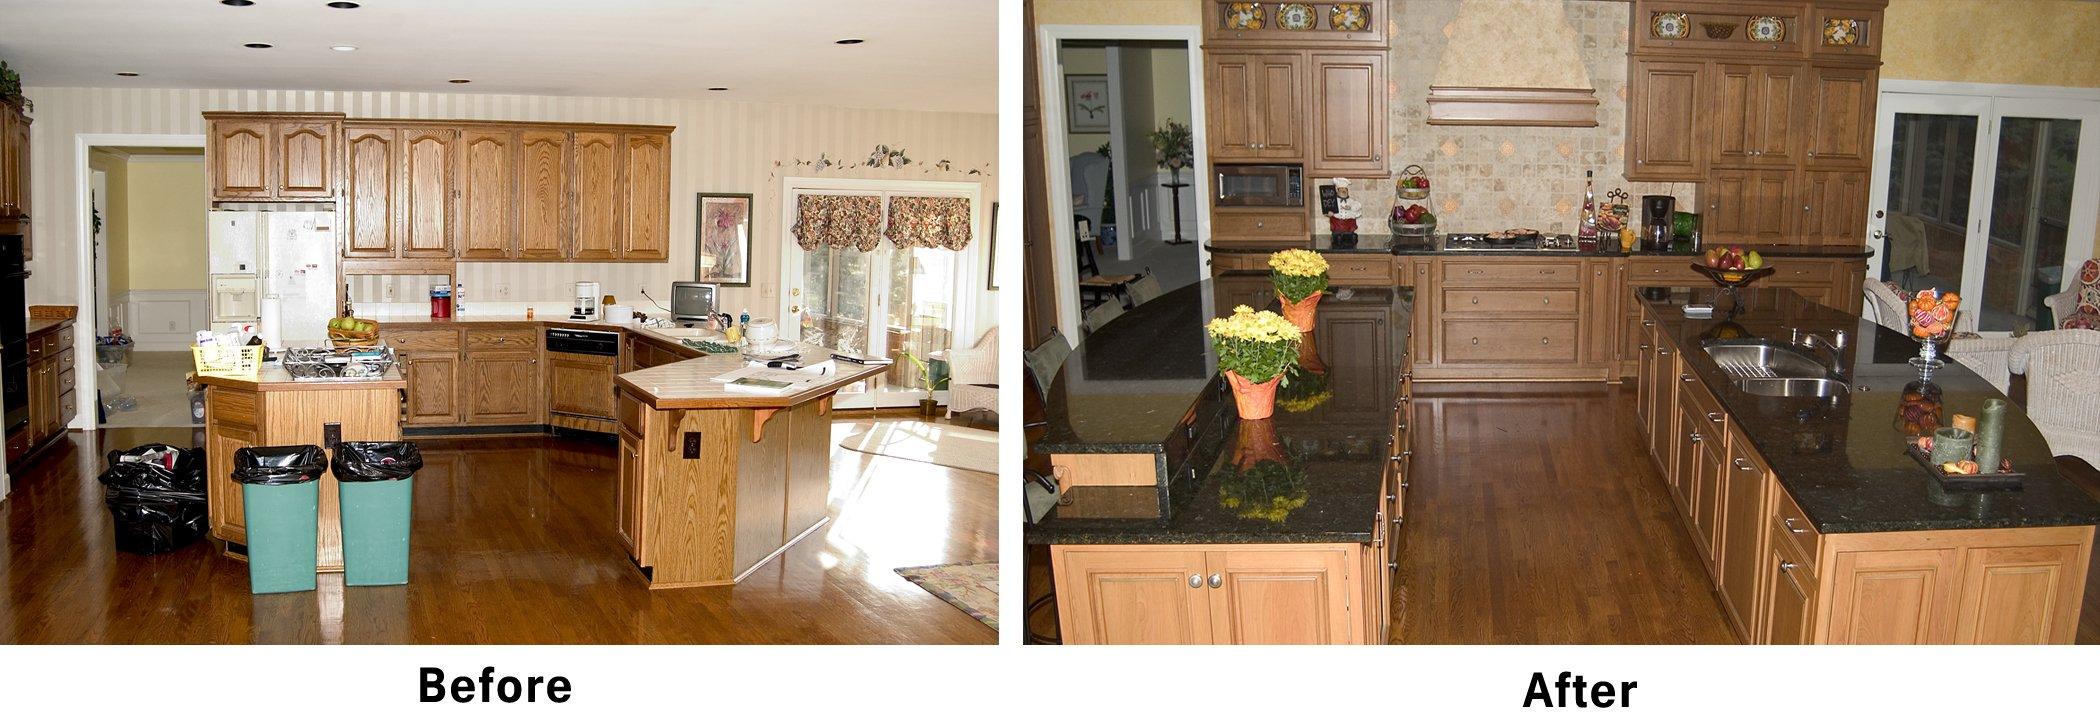 gallery kitchen remodel cincinnati Kitchens Stunning home remodeling projects in Cincinnati OH